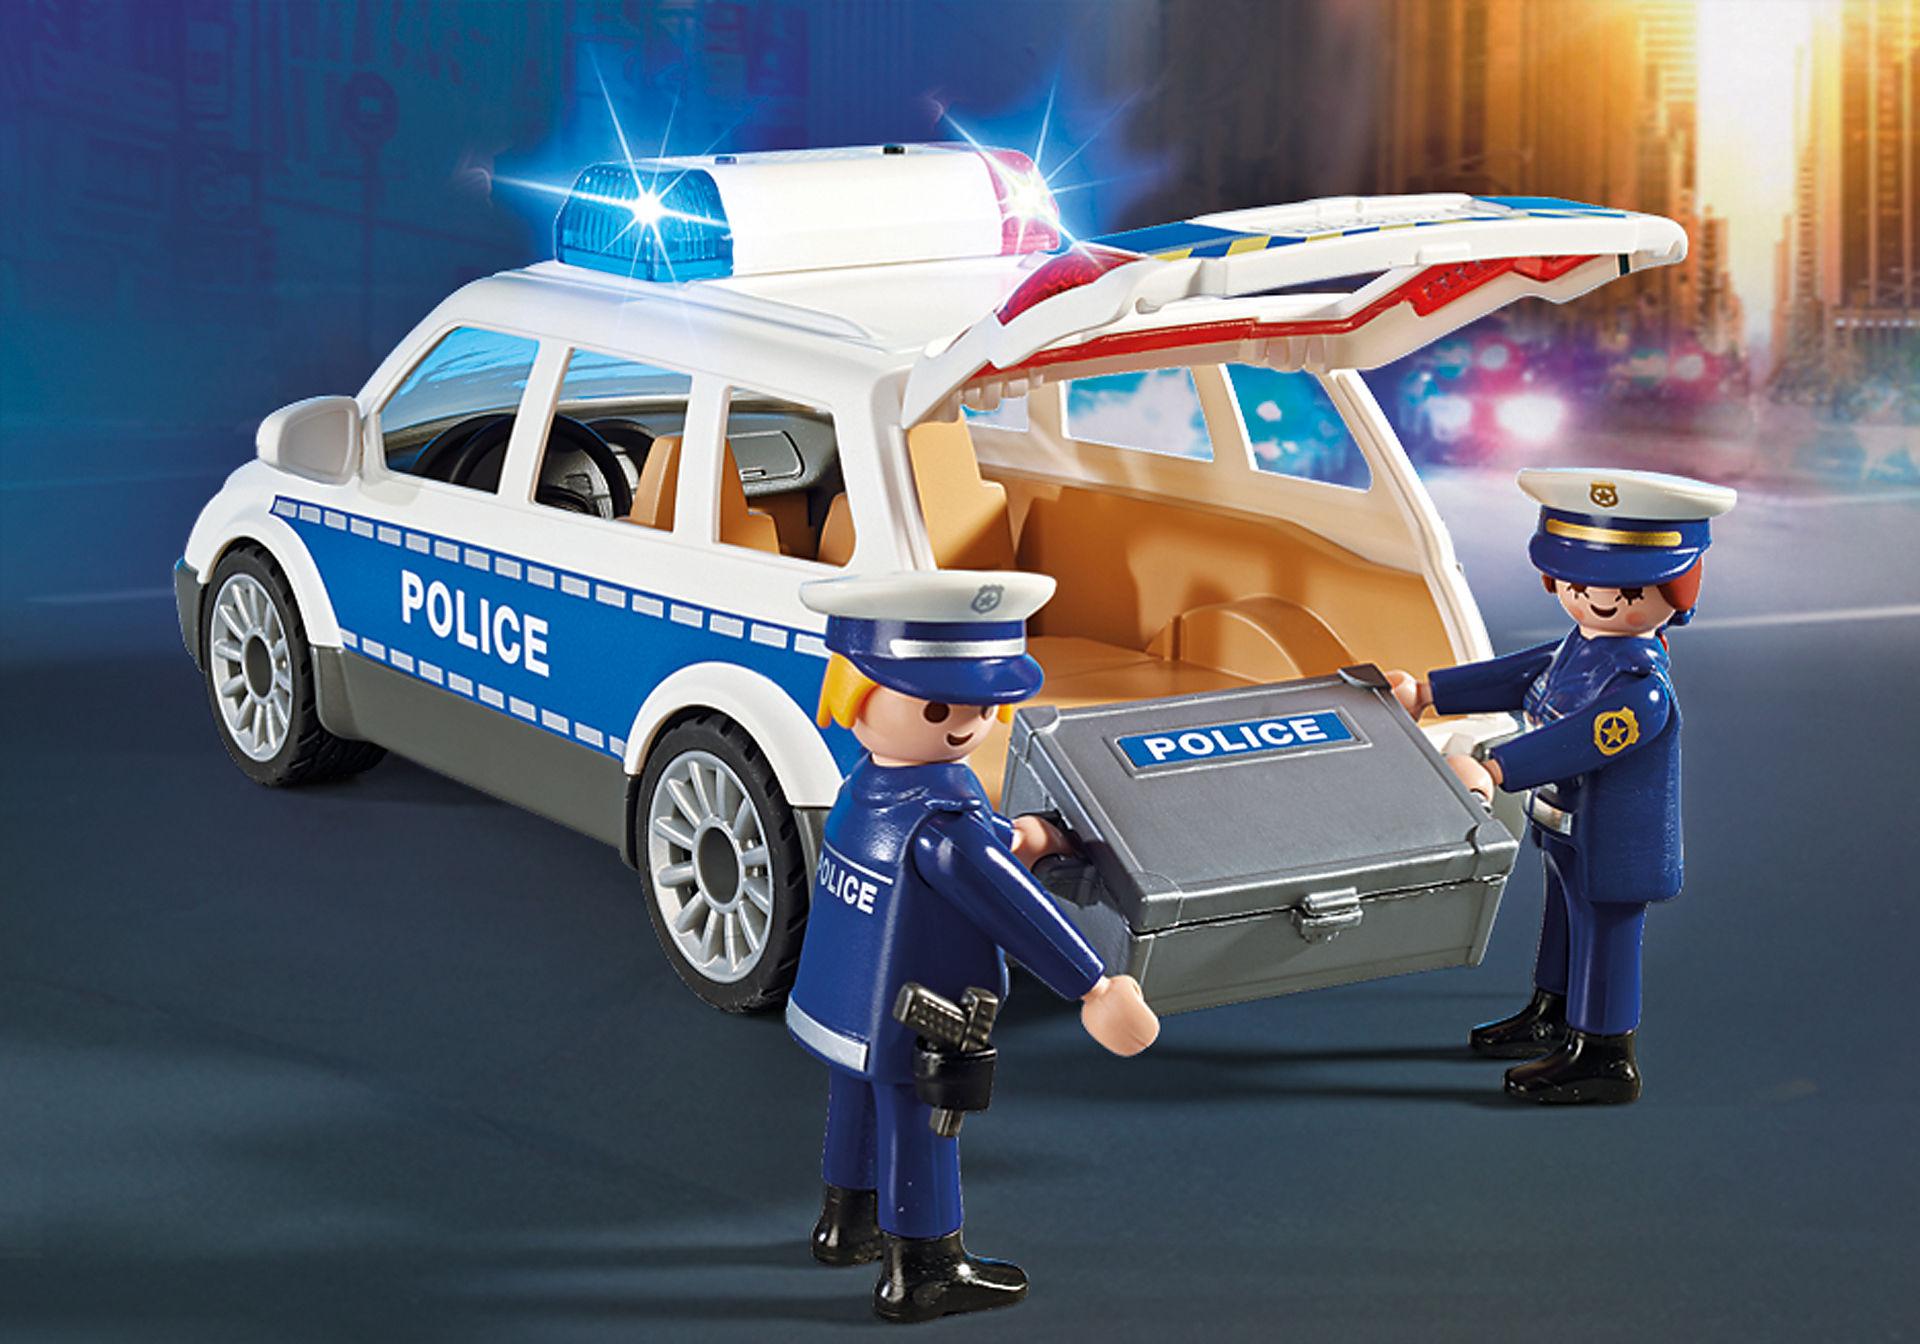 http://media.playmobil.com/i/playmobil/6873_product_extra2/Polizei-Einsatzwagen